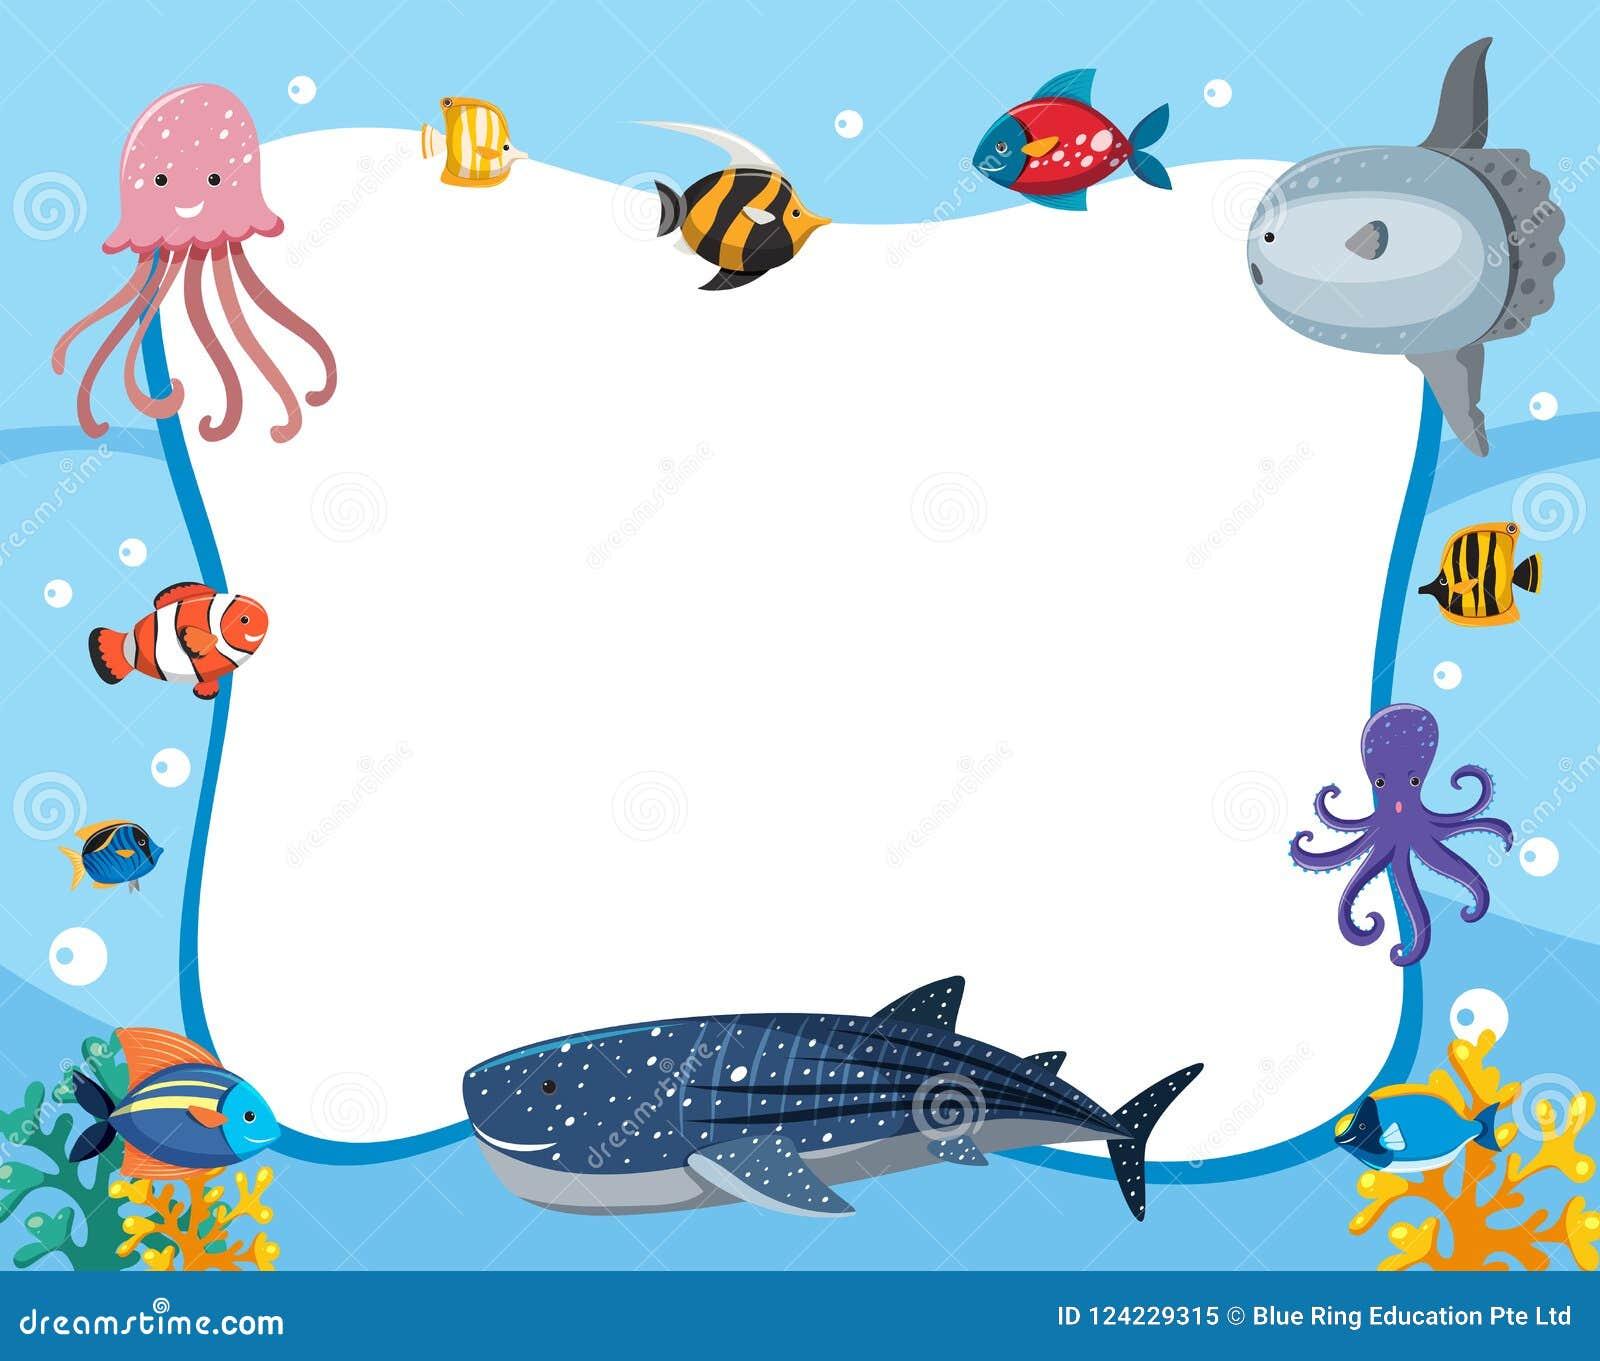 An Underwater Animals Border Stock Vector - Illustration ...